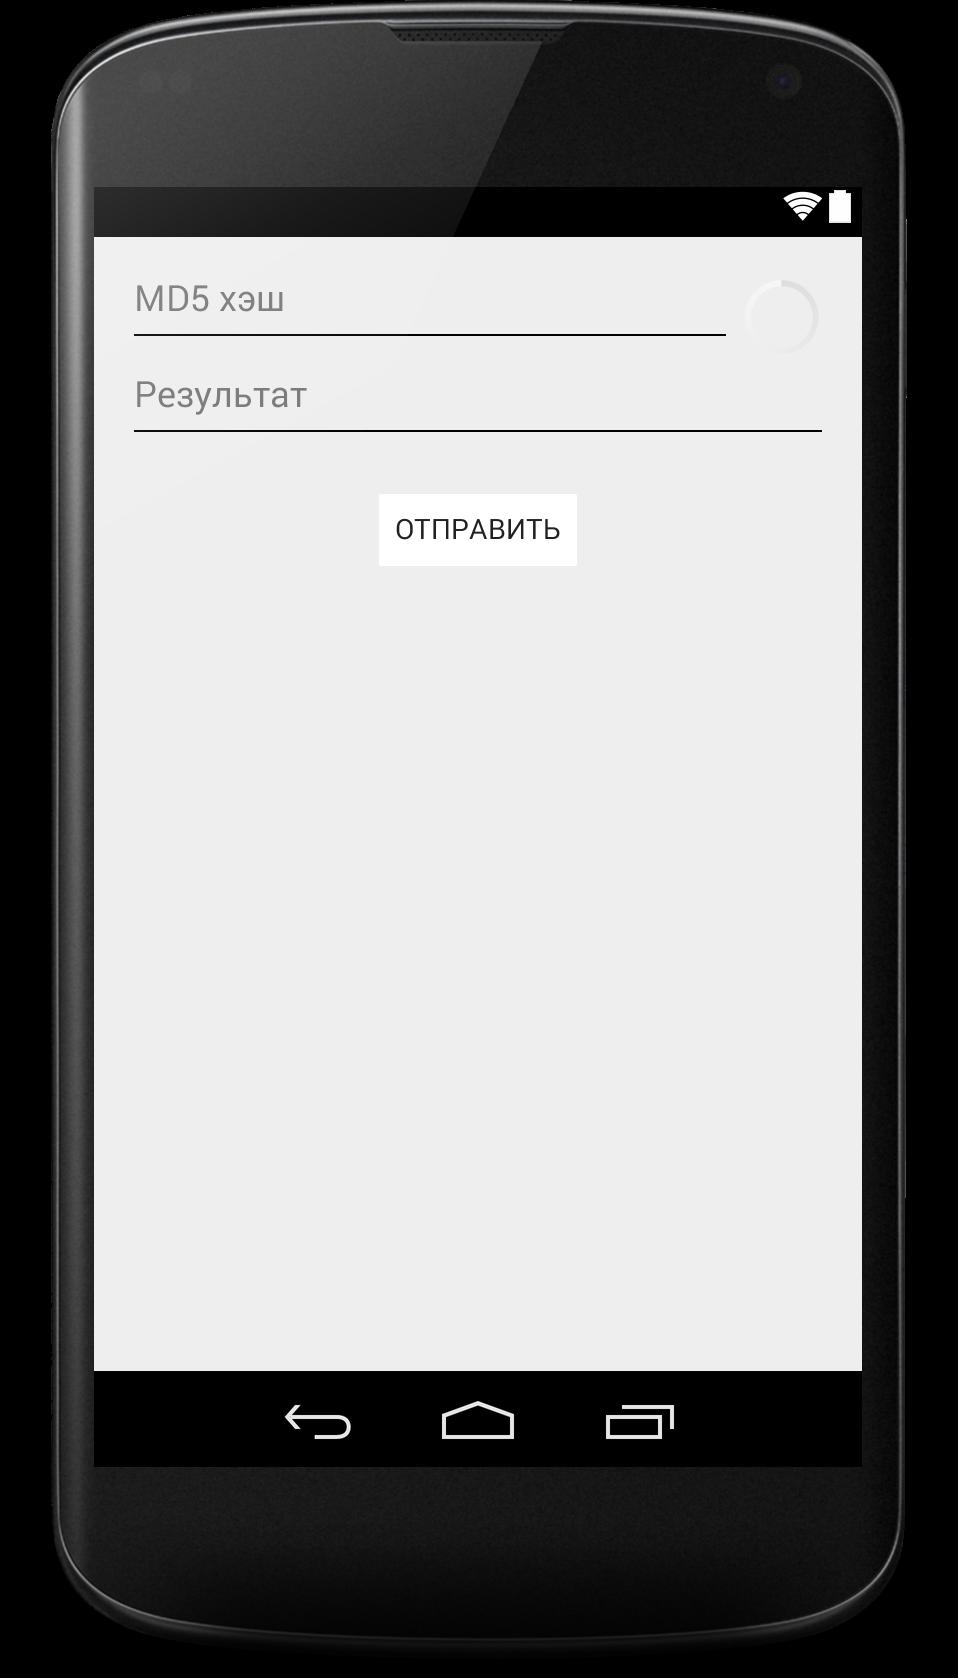 Рис. 1. Рендер интерфейса в Android Studio